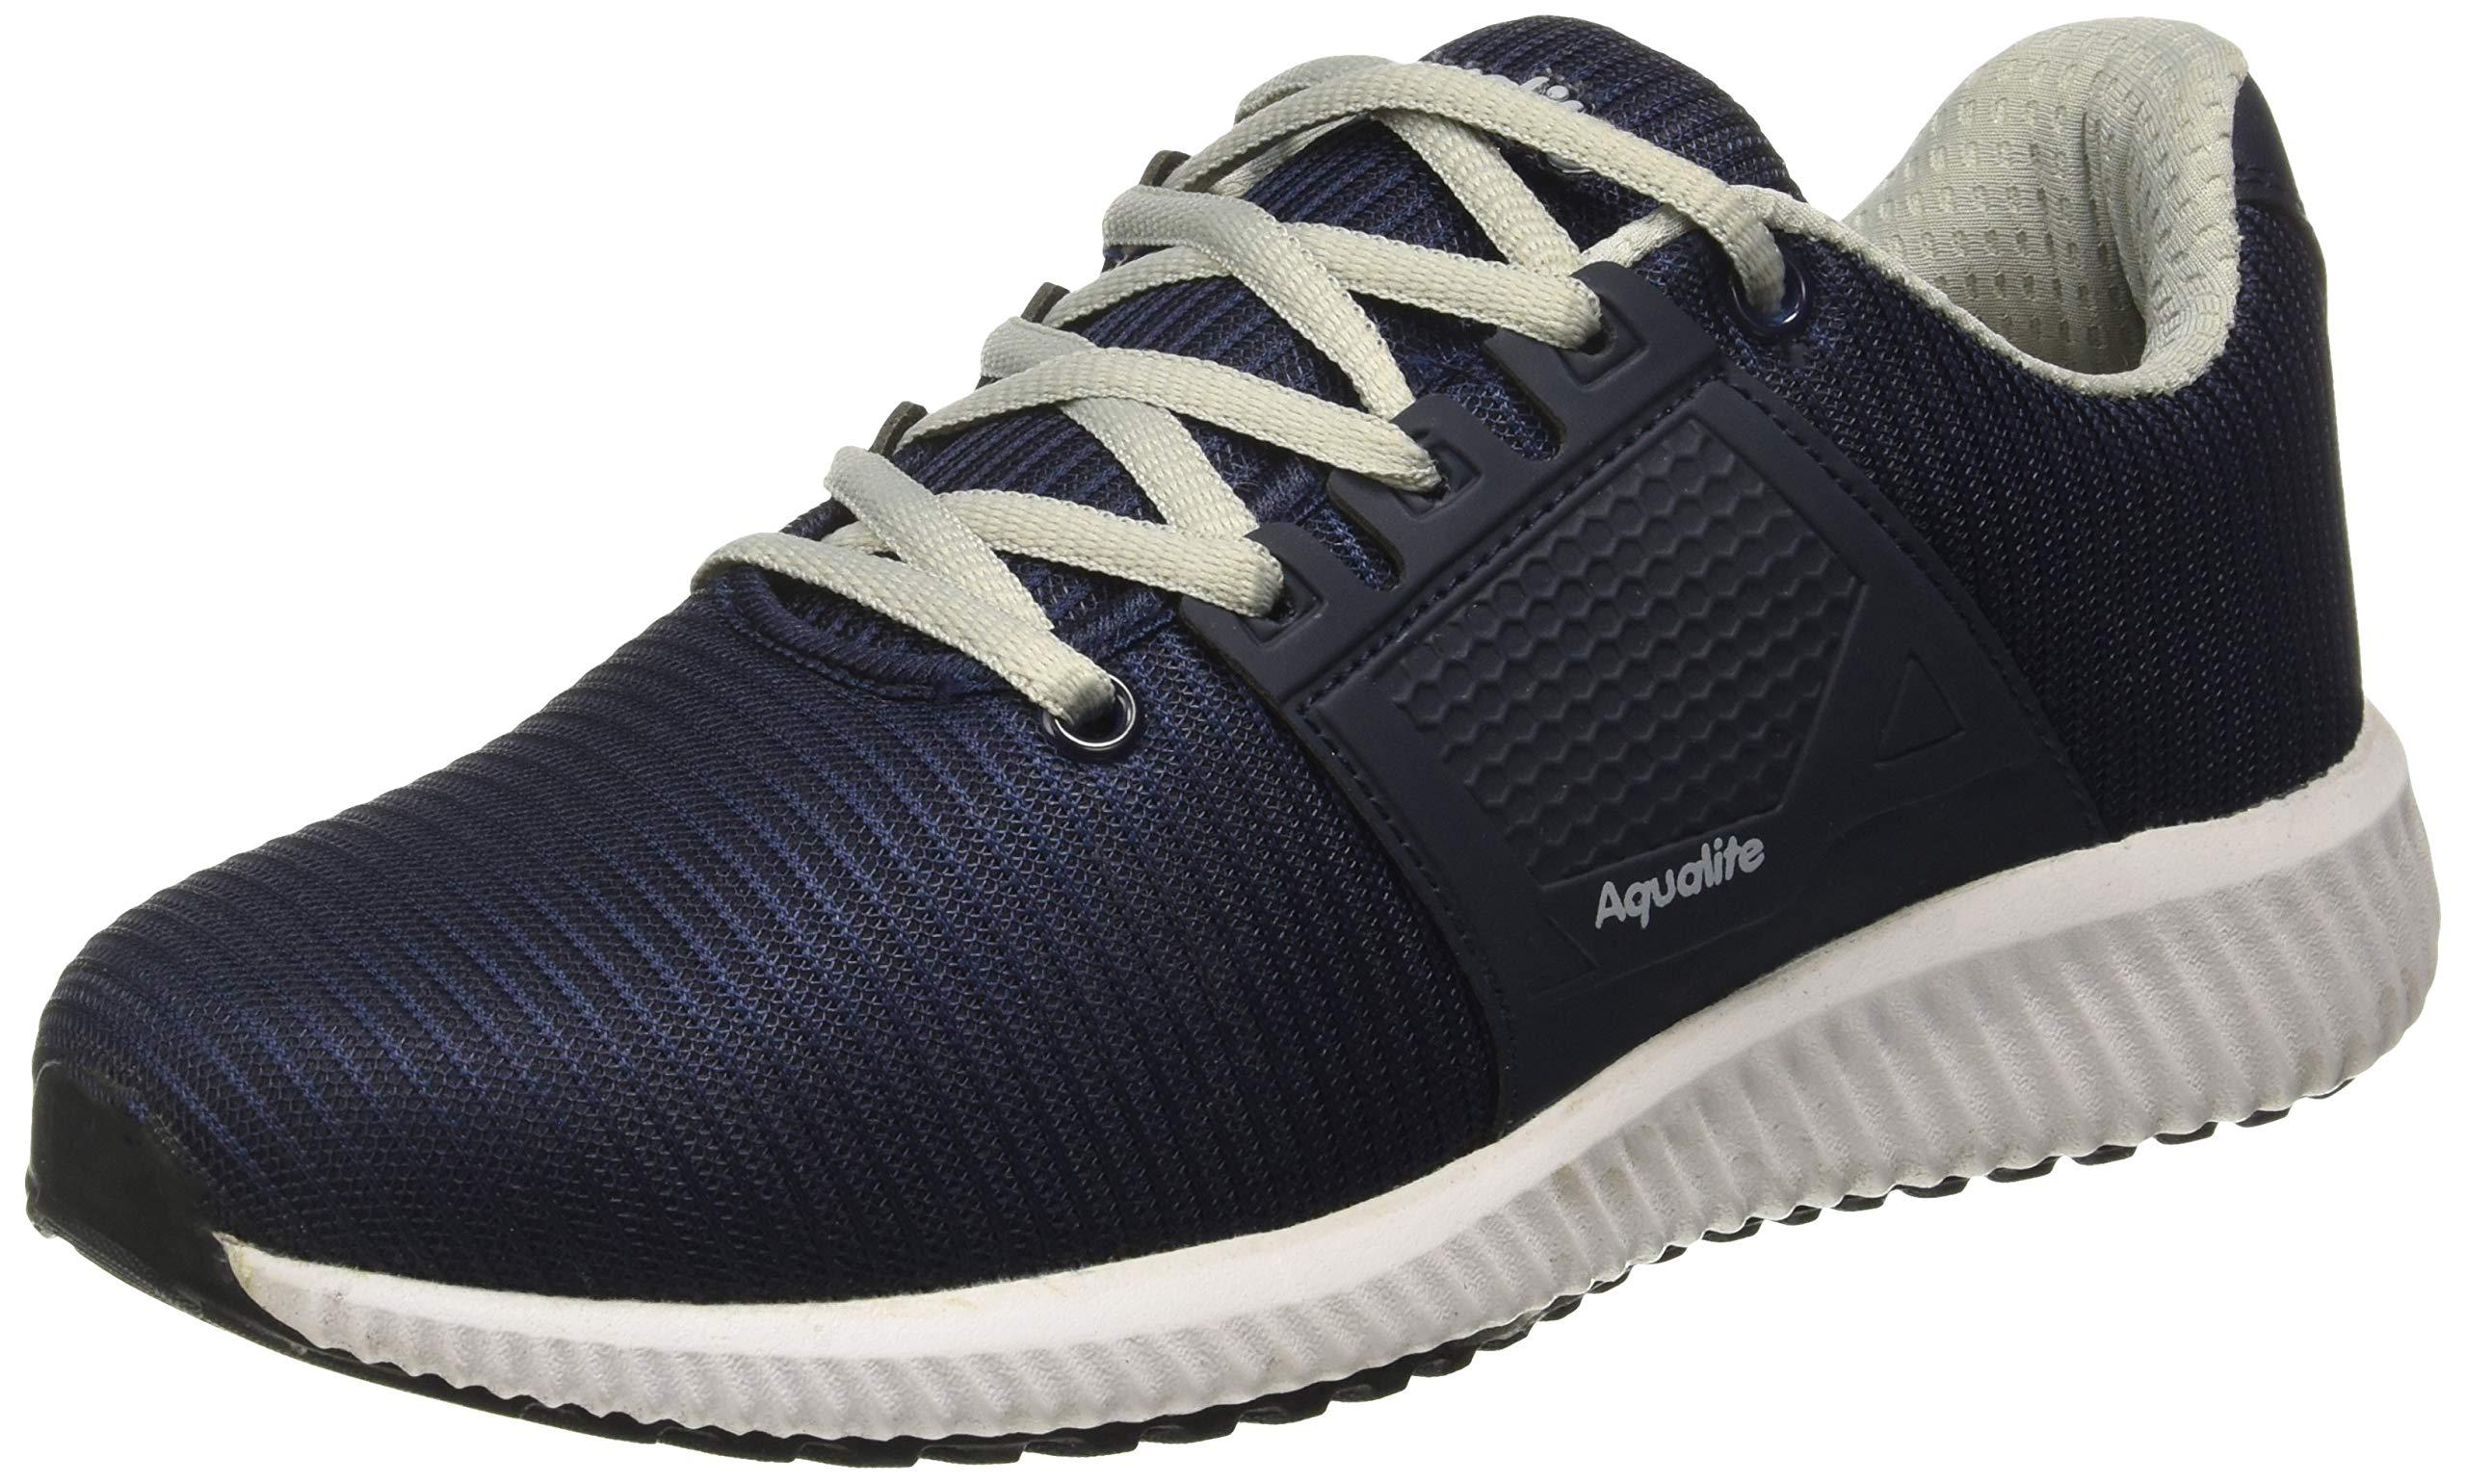 Aqualite Men's Running Shoes- Buy